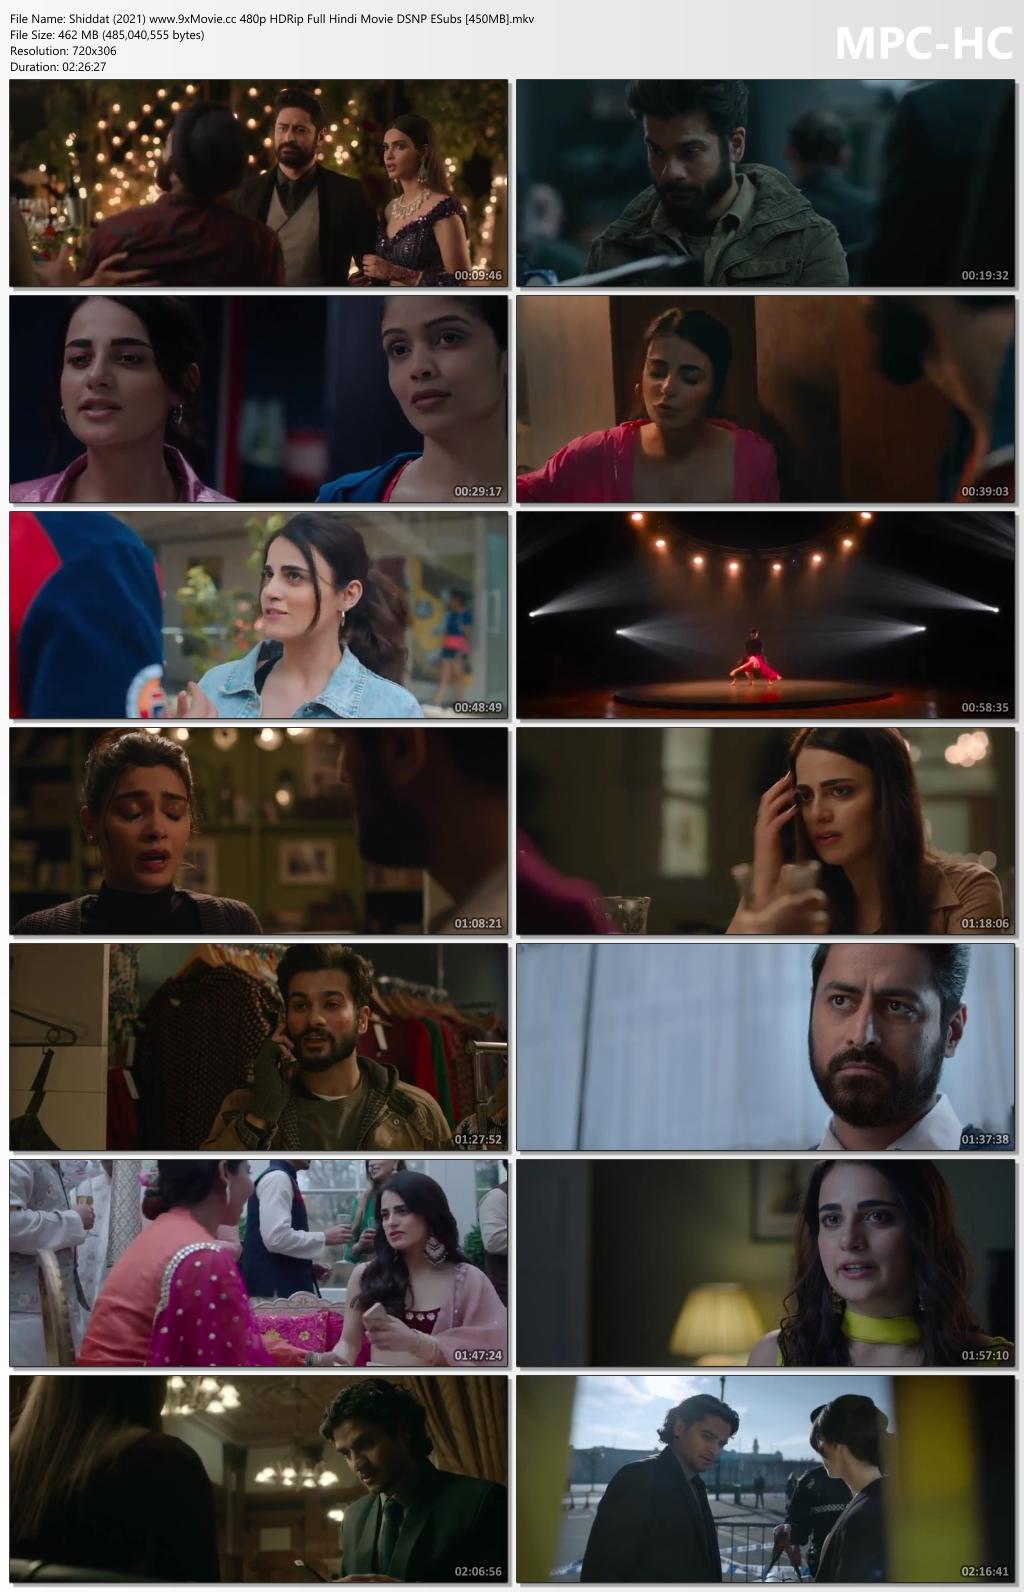 Shiddat-2021-www-9x-Movie-cc-480p-HDRip-Full-Hindi-Movie-DSNP-ESubs-450-MB-mkv